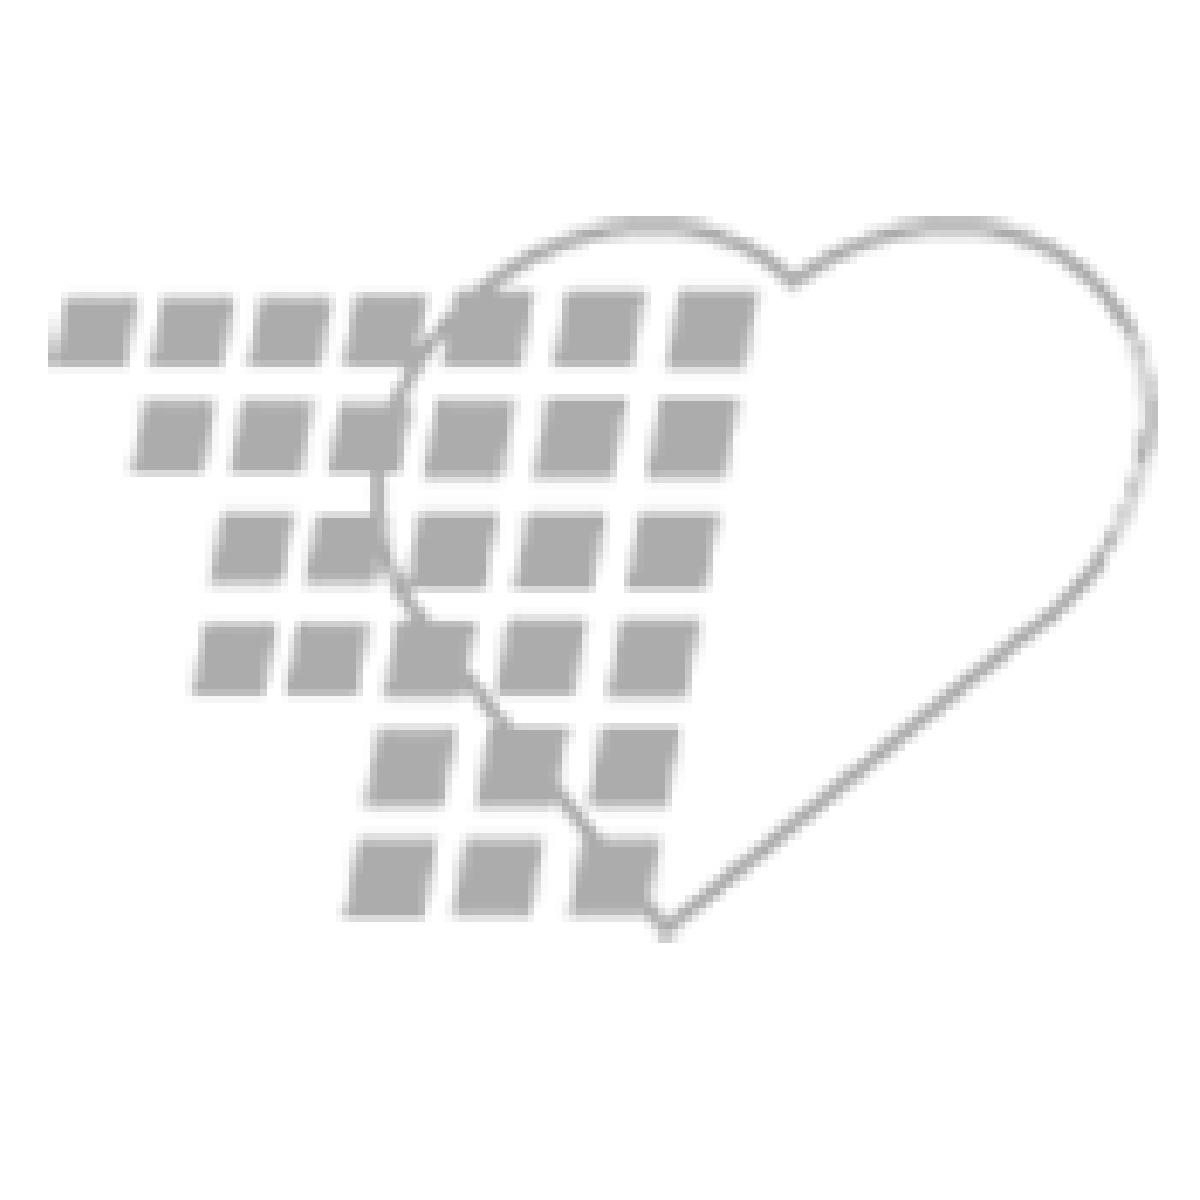 06-93-3884 - EpiPen Trainer